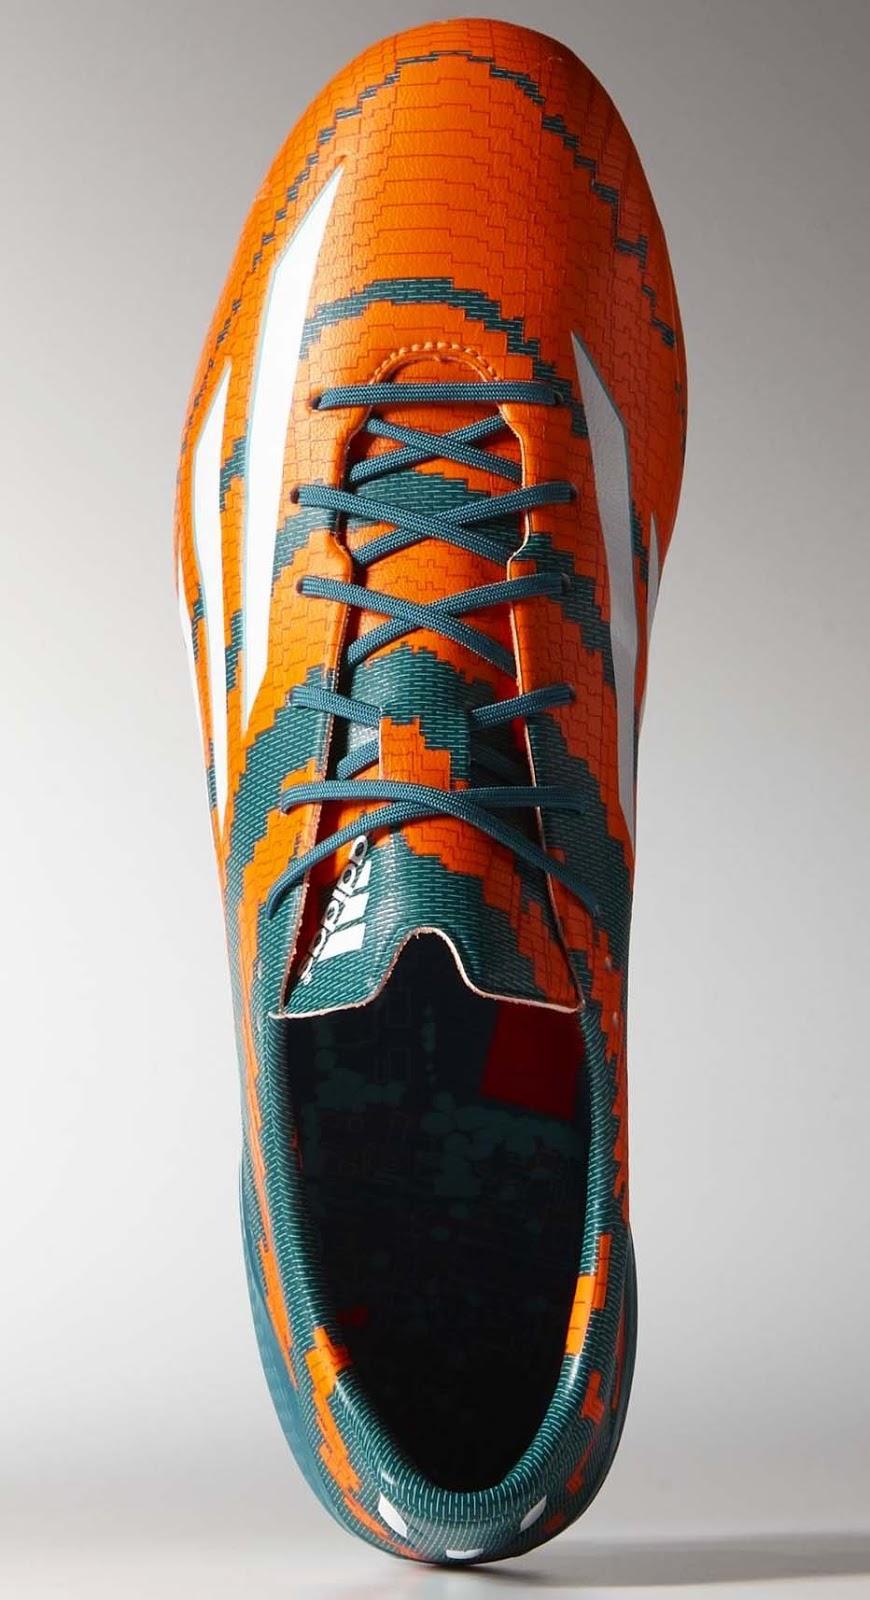 New-Adidas-Messi-10-1-2015-Football-Boots (4).jpg